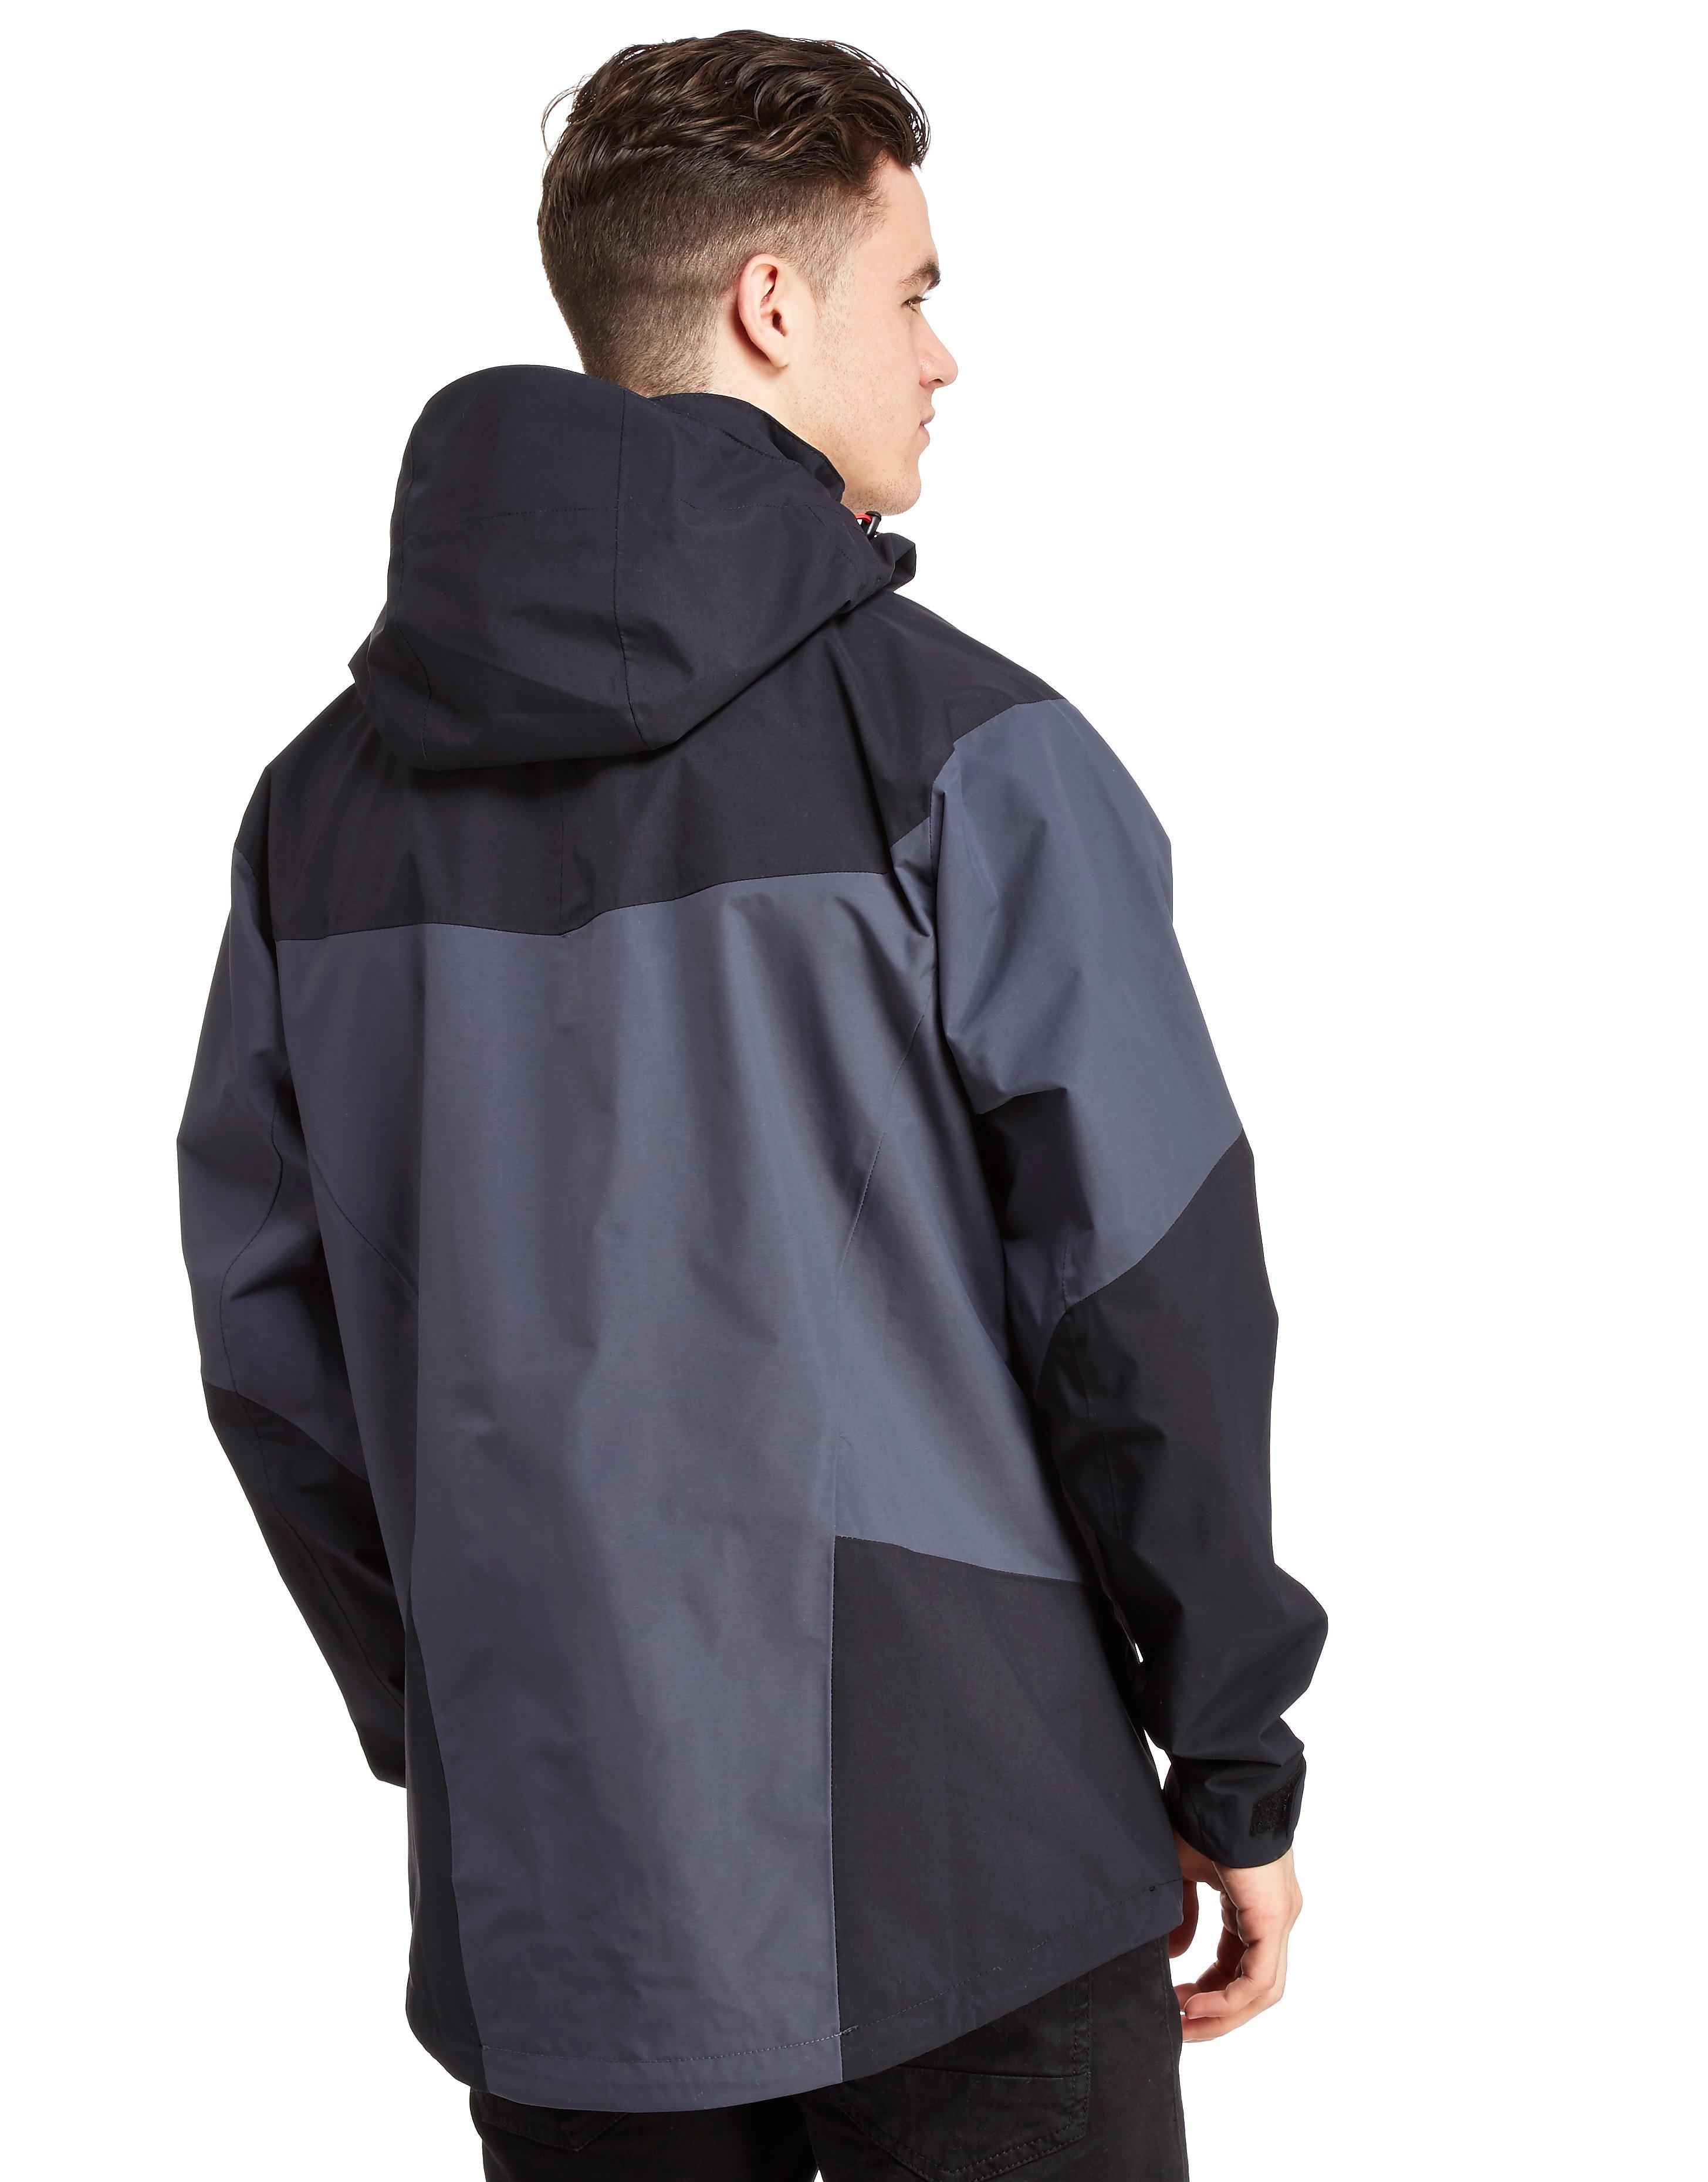 Berghaus Arran Hydroshell Jacket